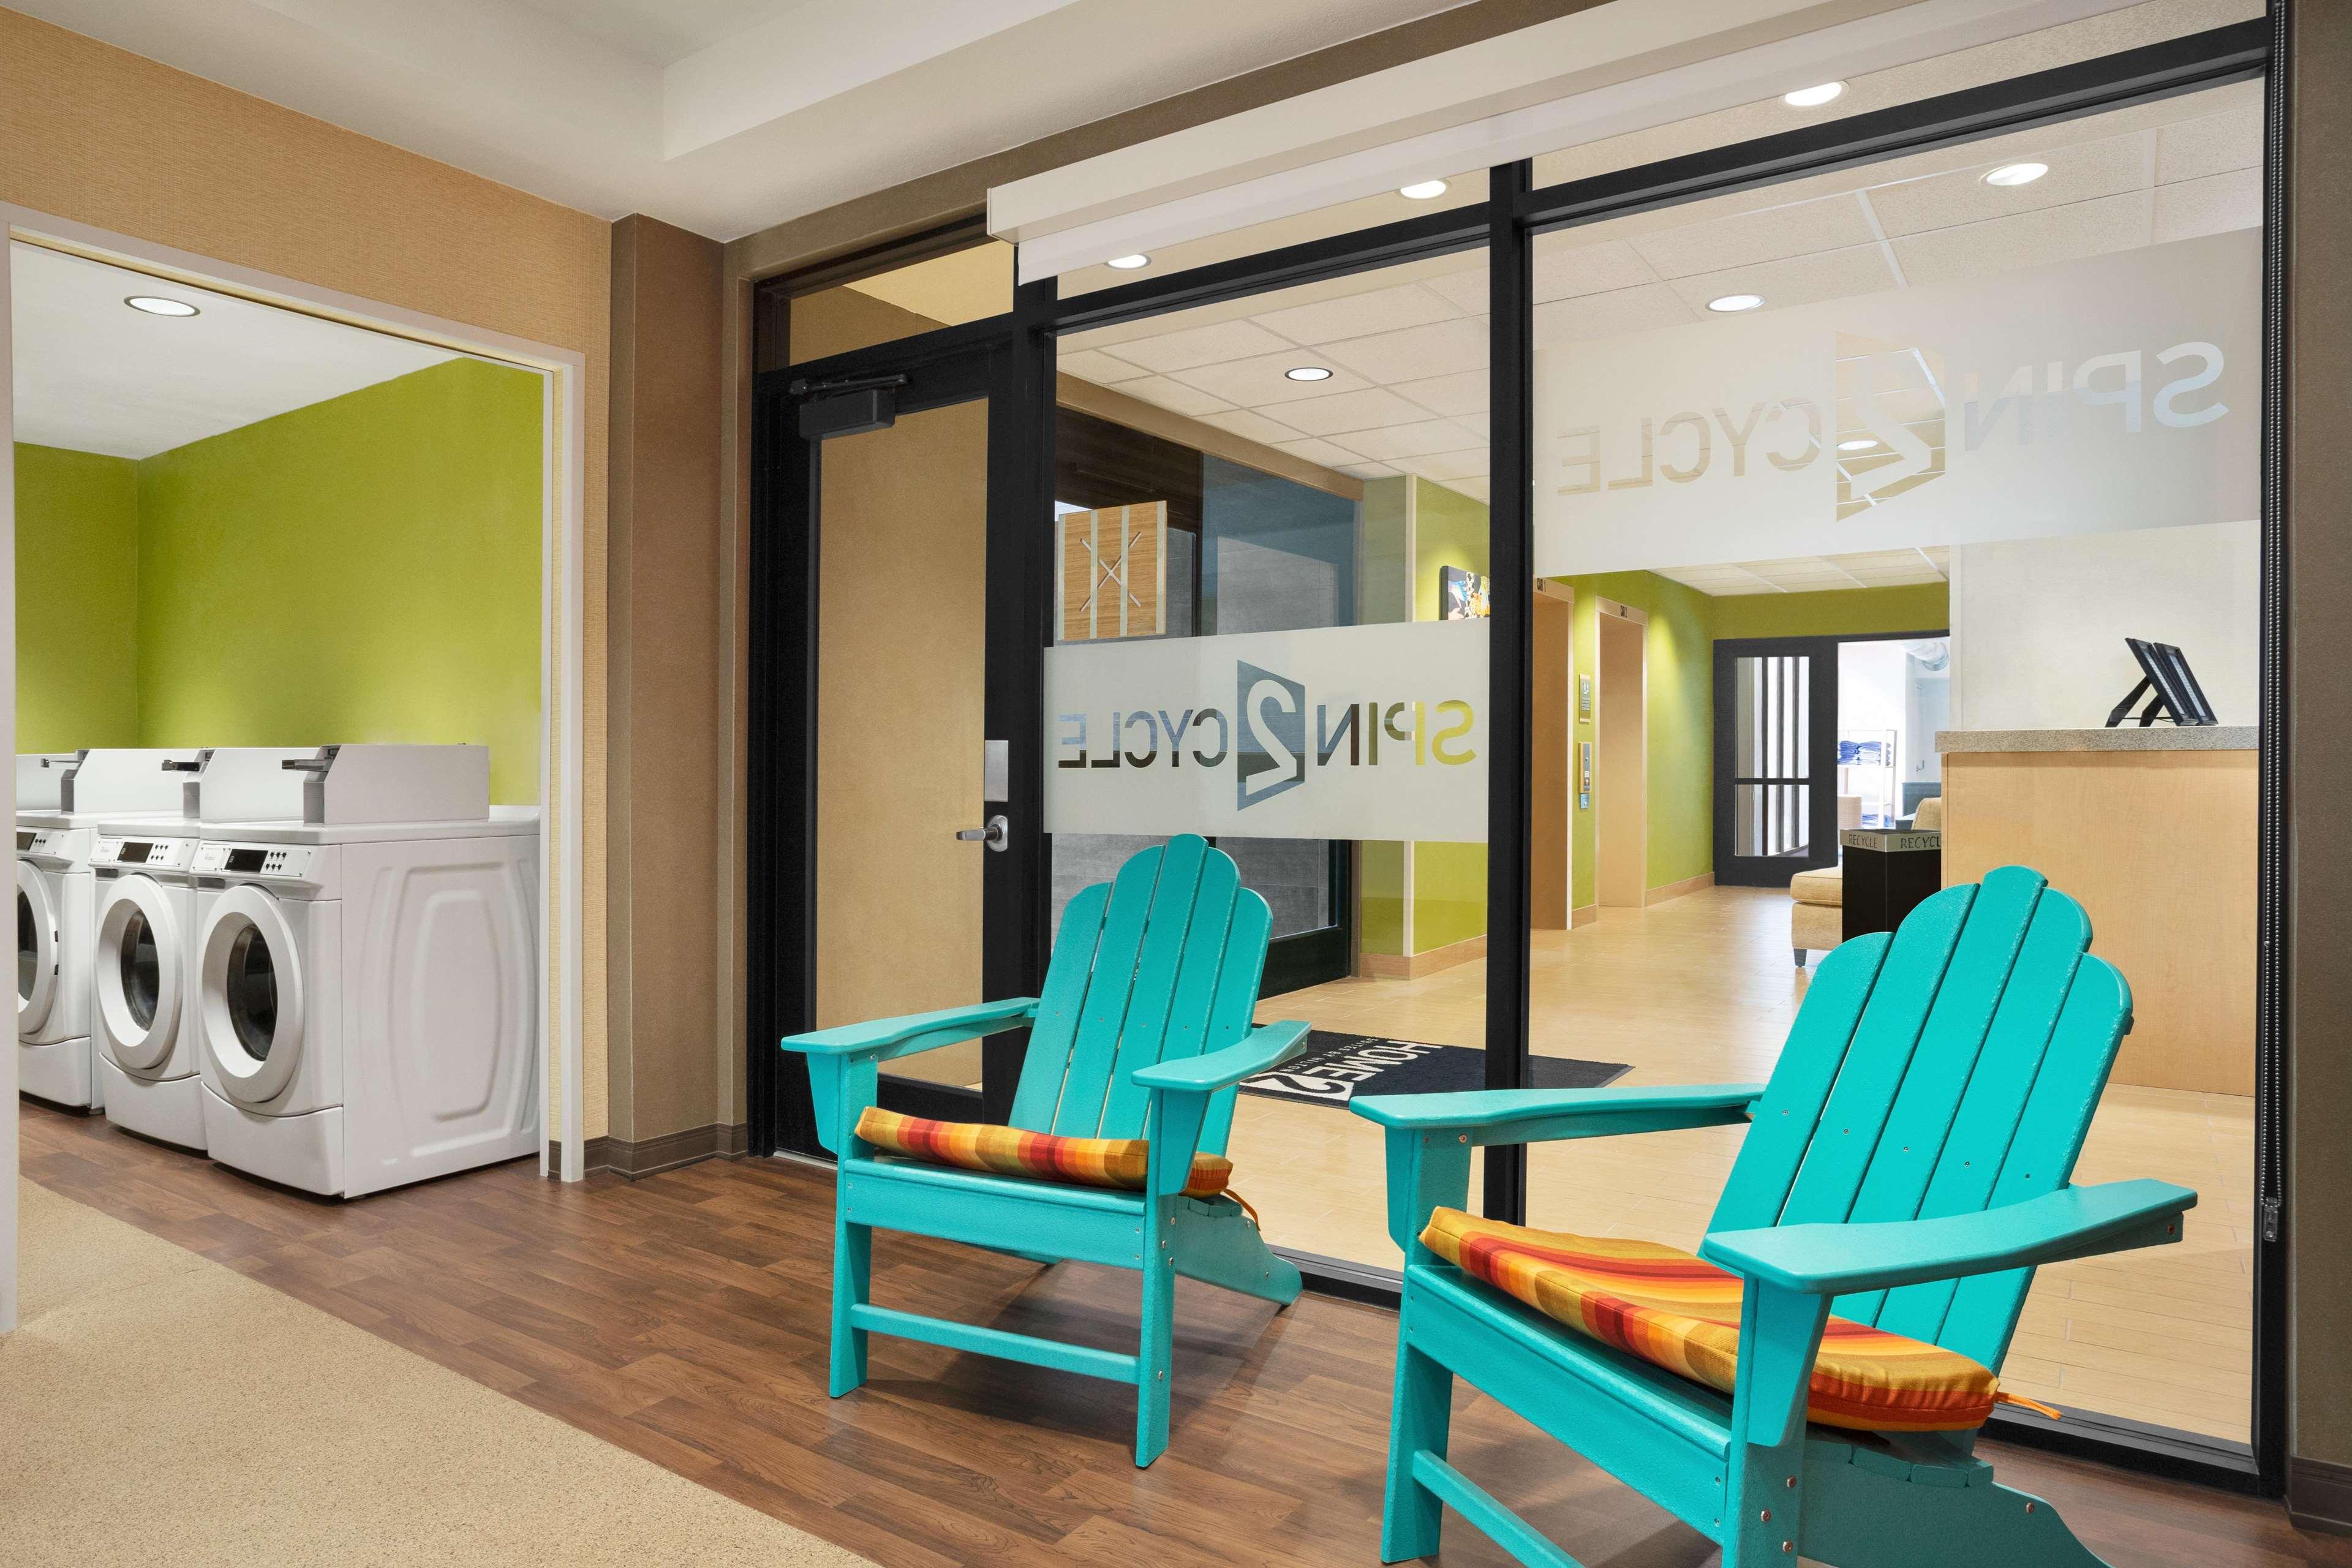 Home2 Suites by Hilton Elko image 15